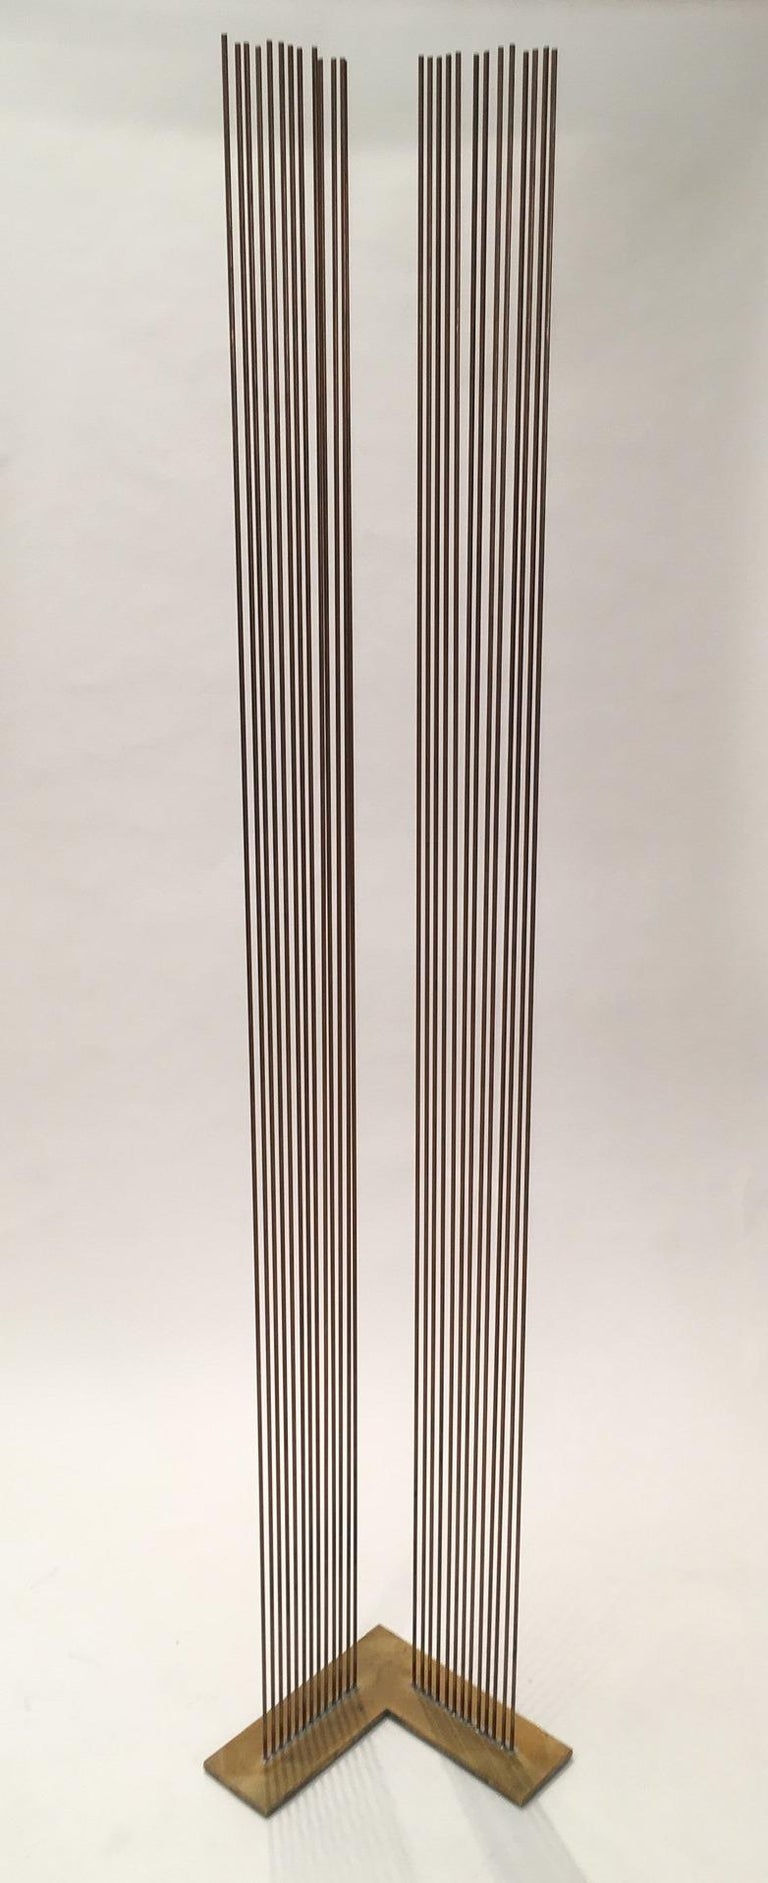 American Val Bertoia Sound Sculptures, 2012 For Sale